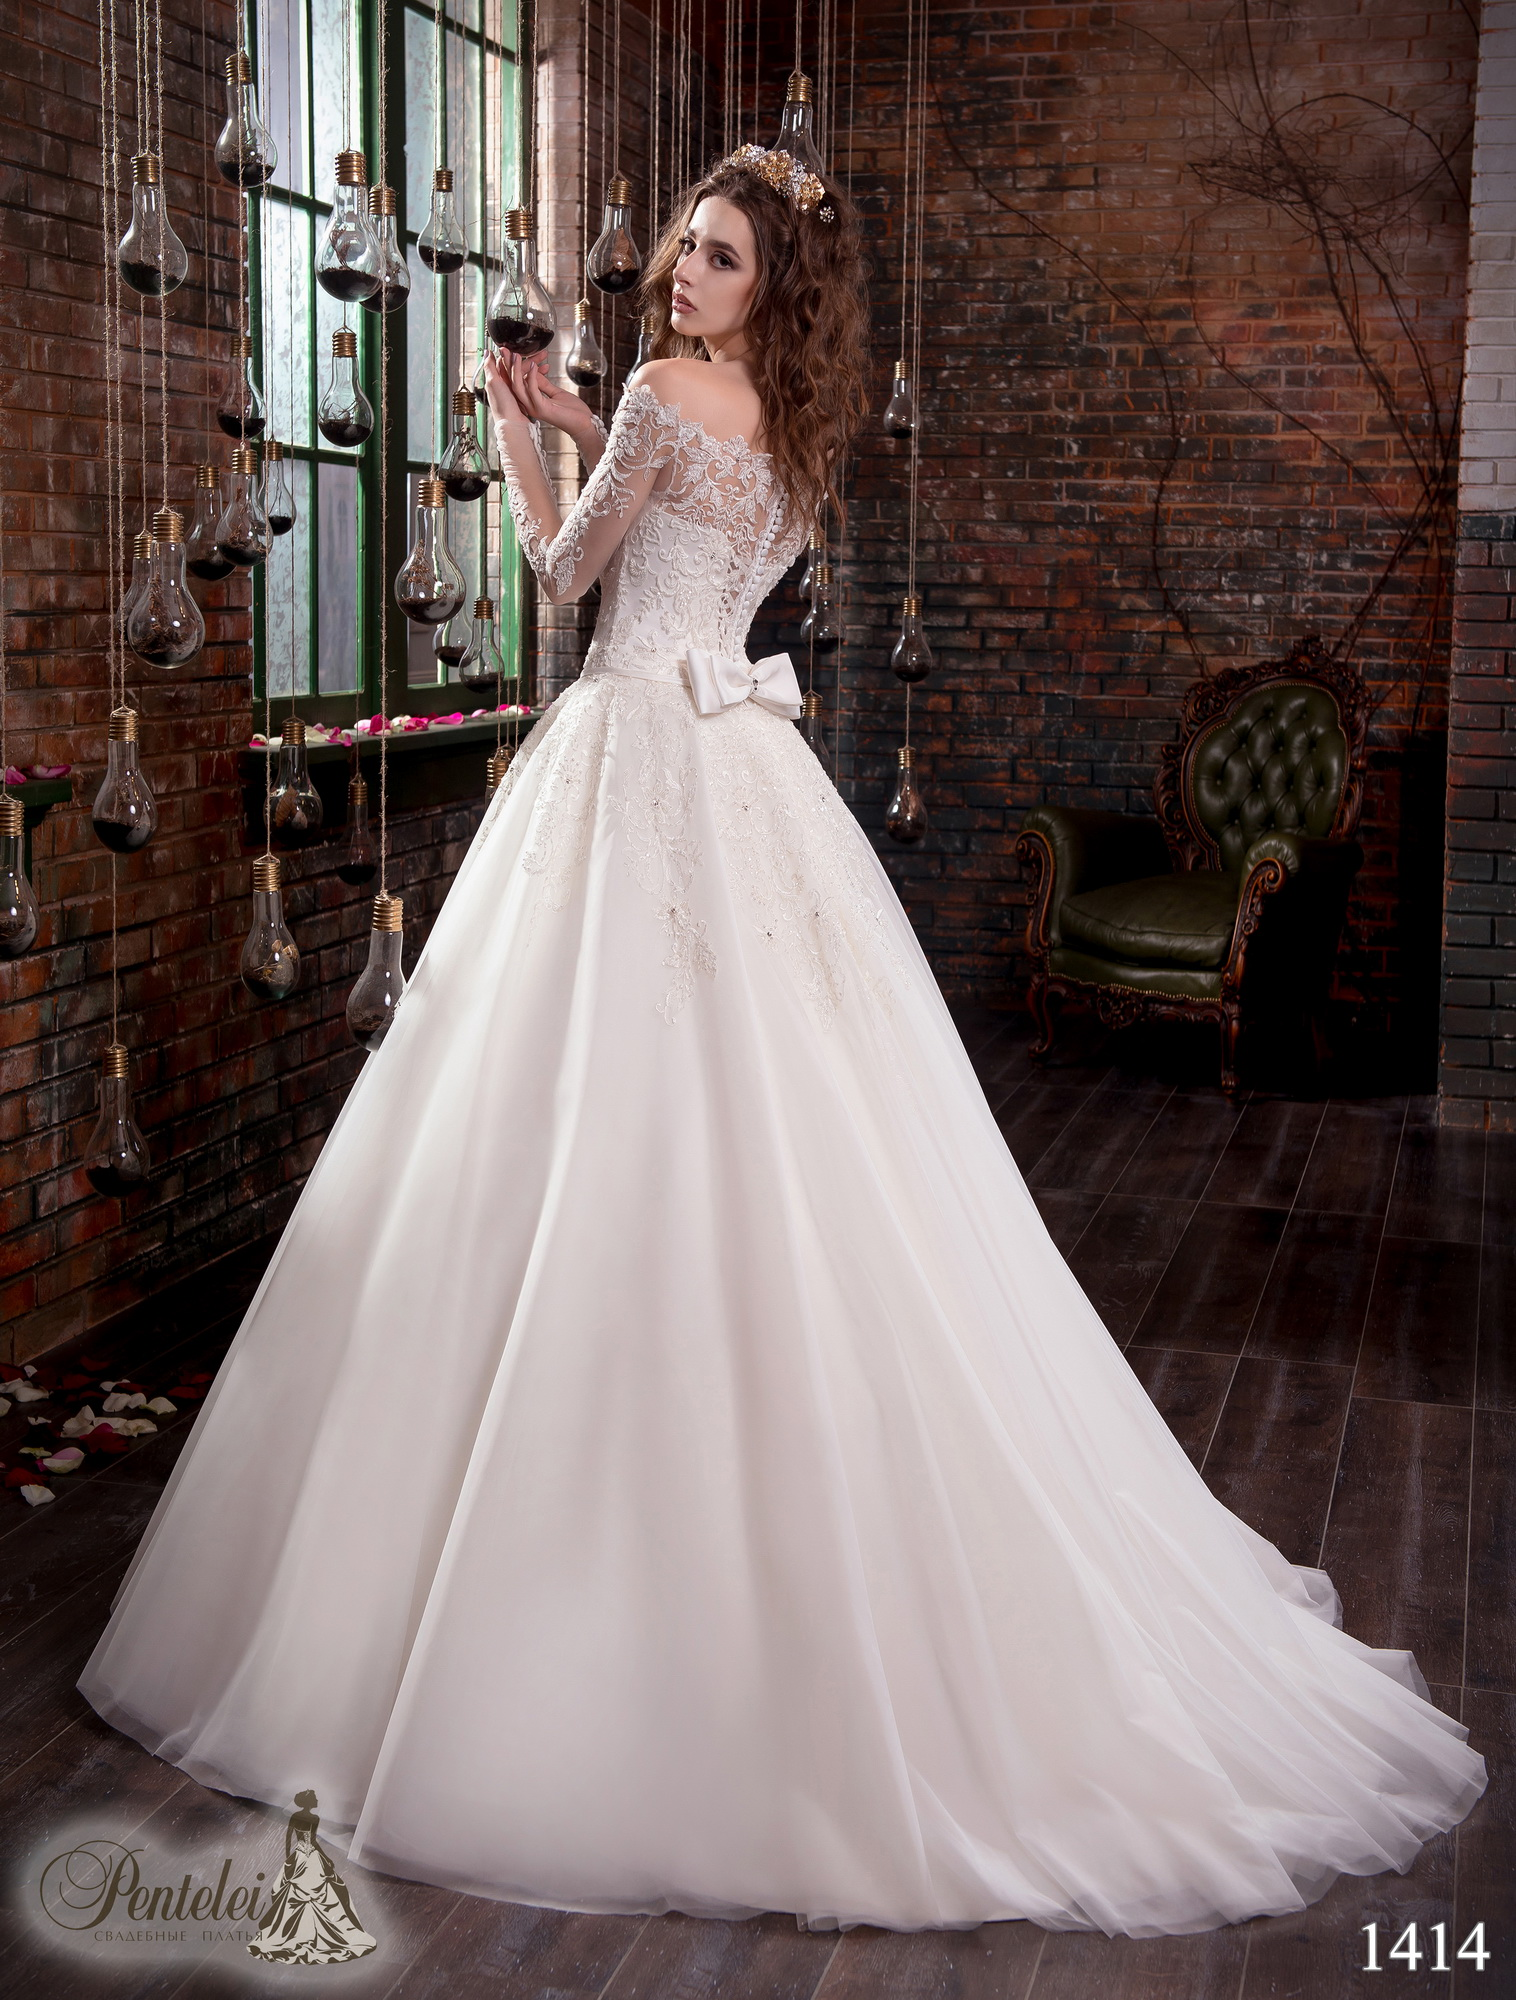 1414 | Buy wedding dresses wholesale from Pentelei